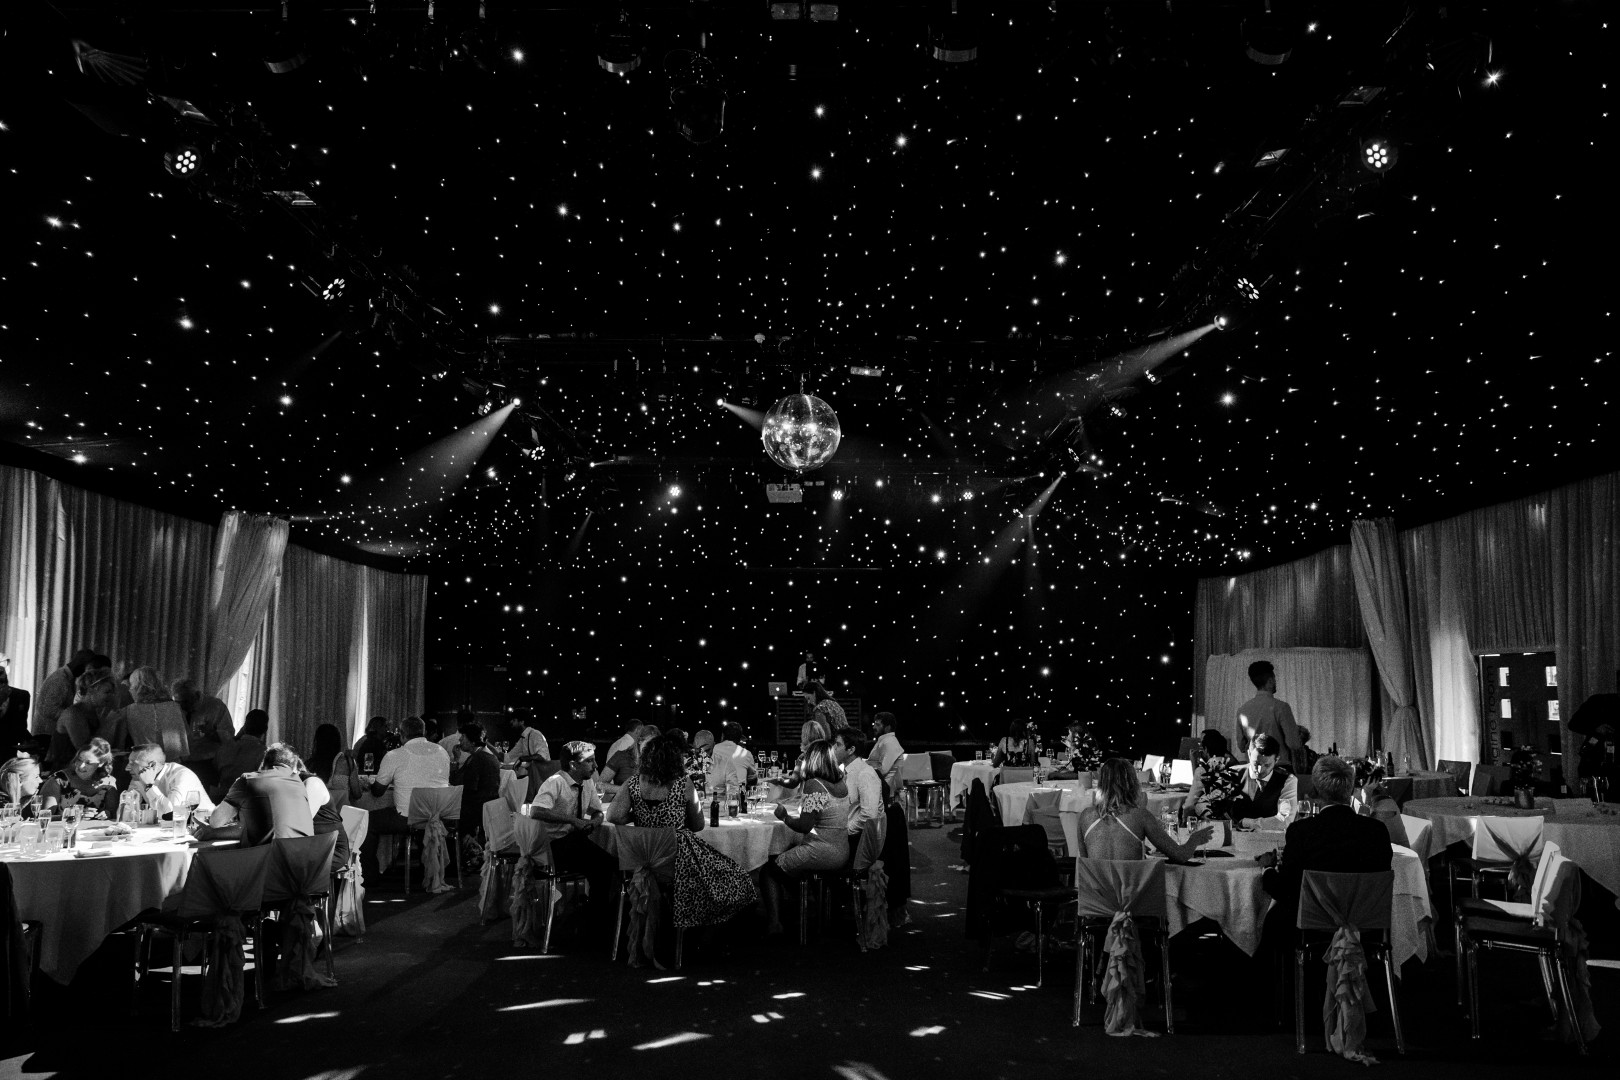 We loved our wedding in The Hangar, Kesgrave Hall